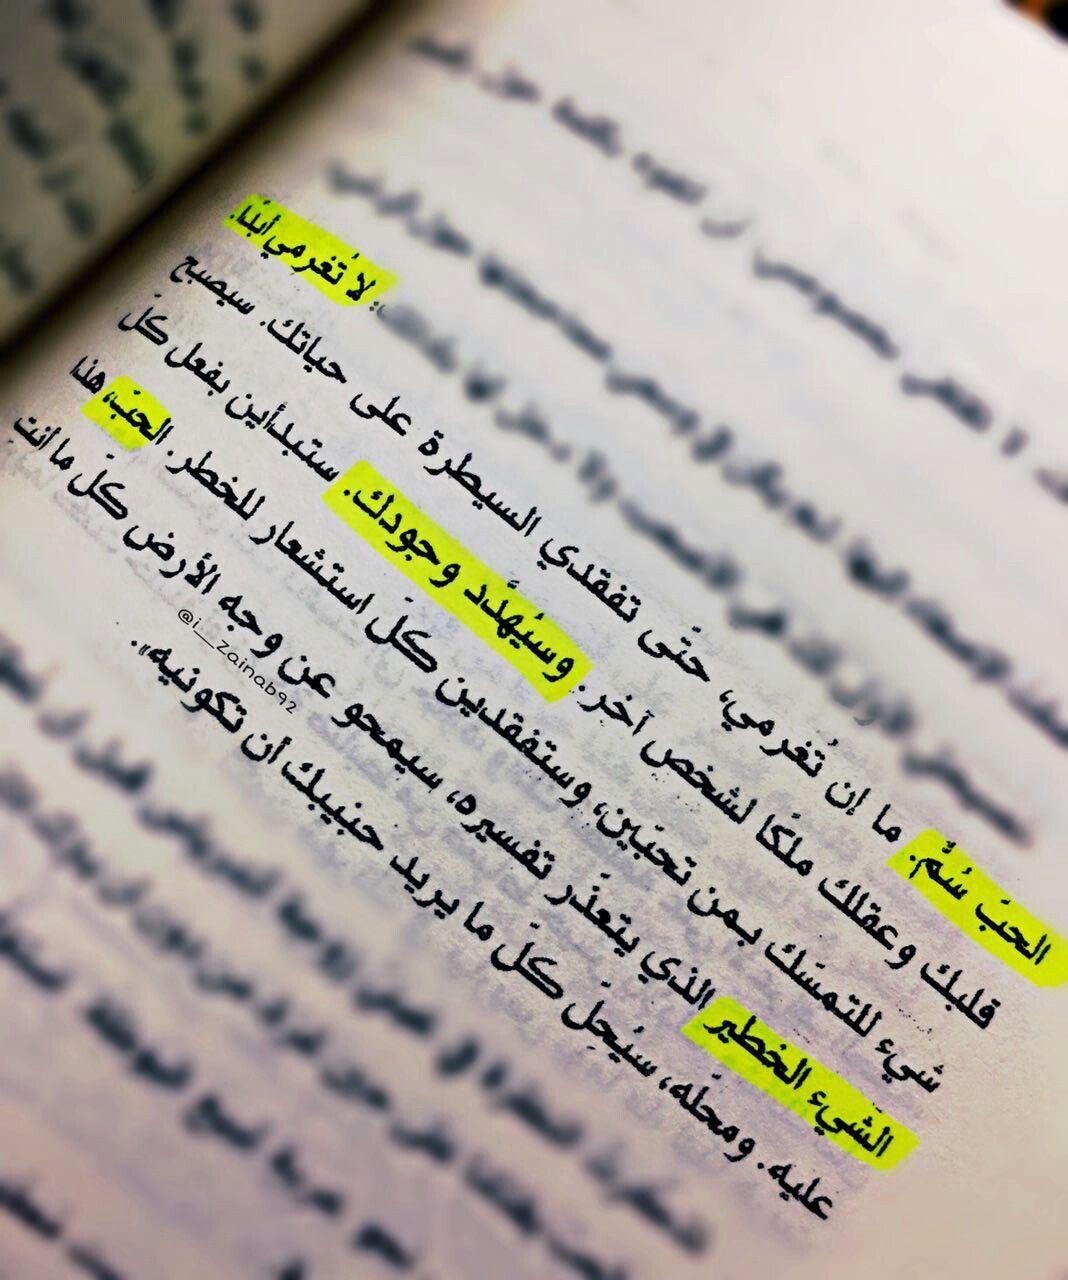 ل أ ت ـغ رم ي أ ب د أ ف ـأ ل ح ب س ـم Quotations Writing Quotes